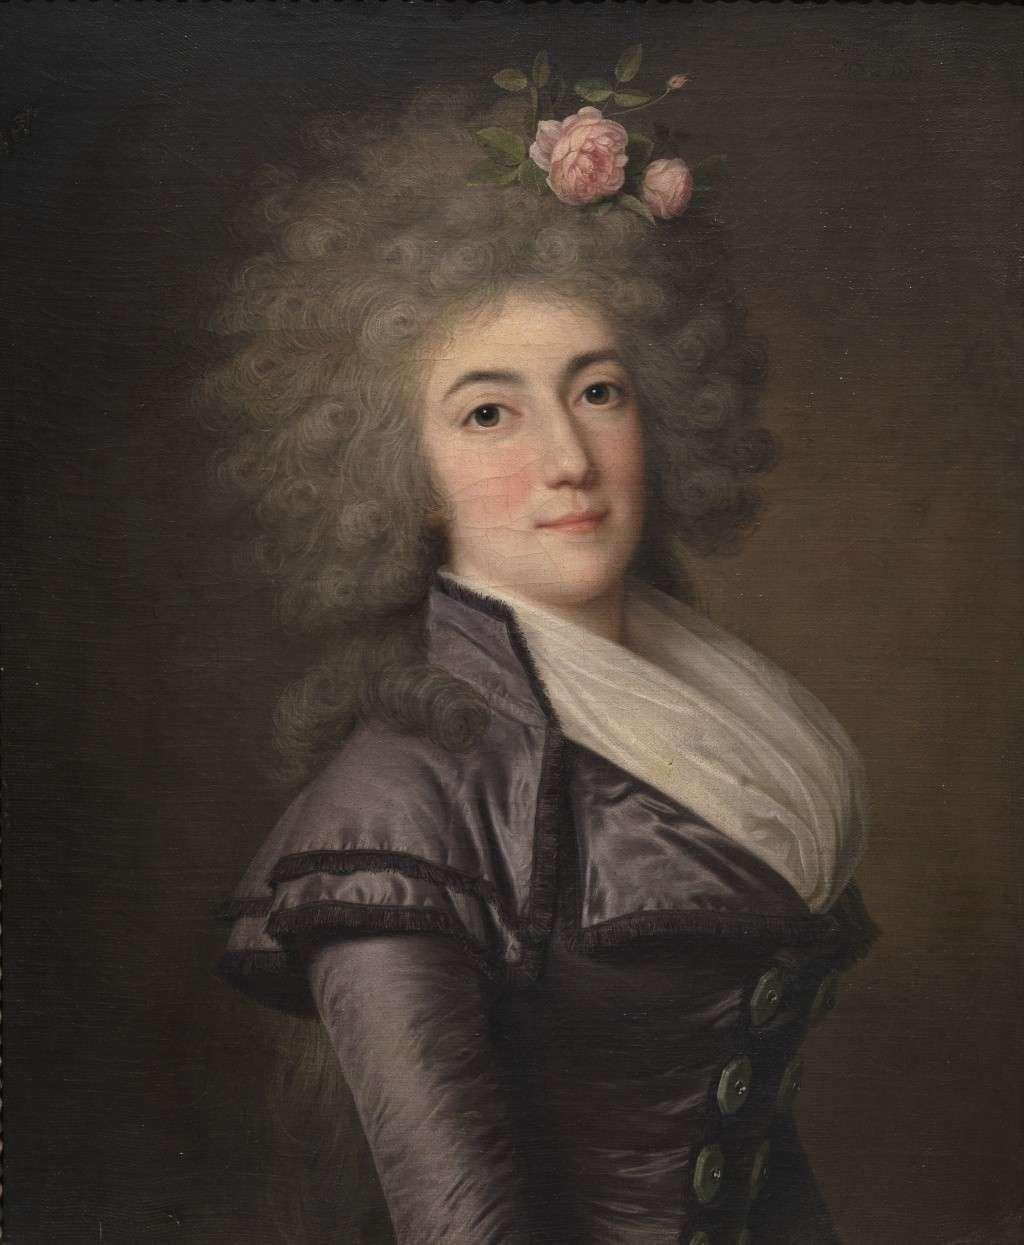 wertmuller - Marie-Antoinette en habit de chasse, ou chemise blanche, par Wertmüller (1788) Doaa_i10